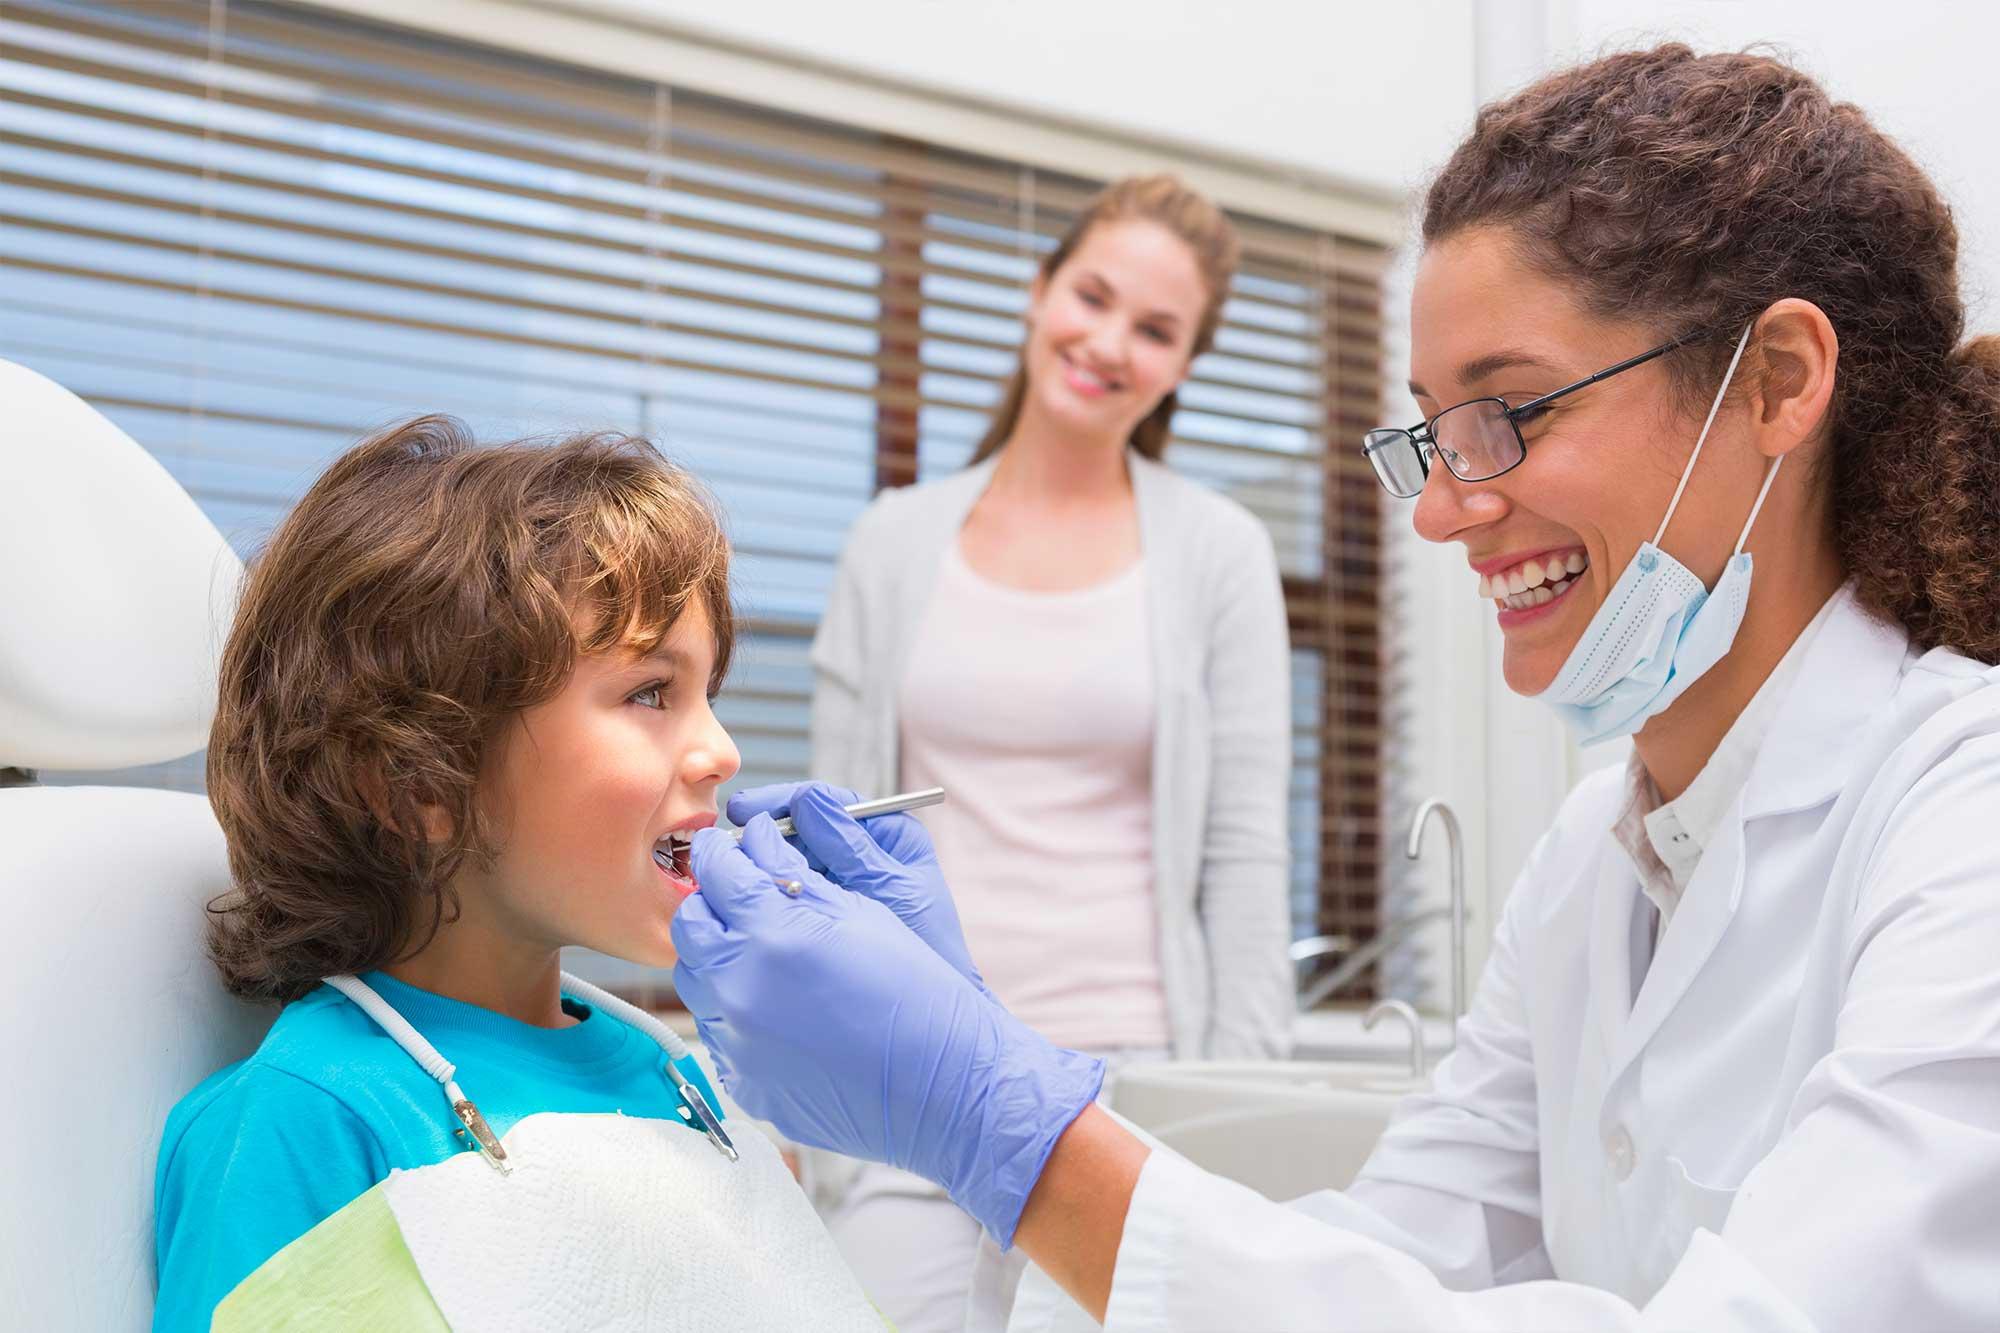 http://www.studiosmilecare.it/wp-content/uploads/2015/12/odontoiatria-pediatrica.jpg